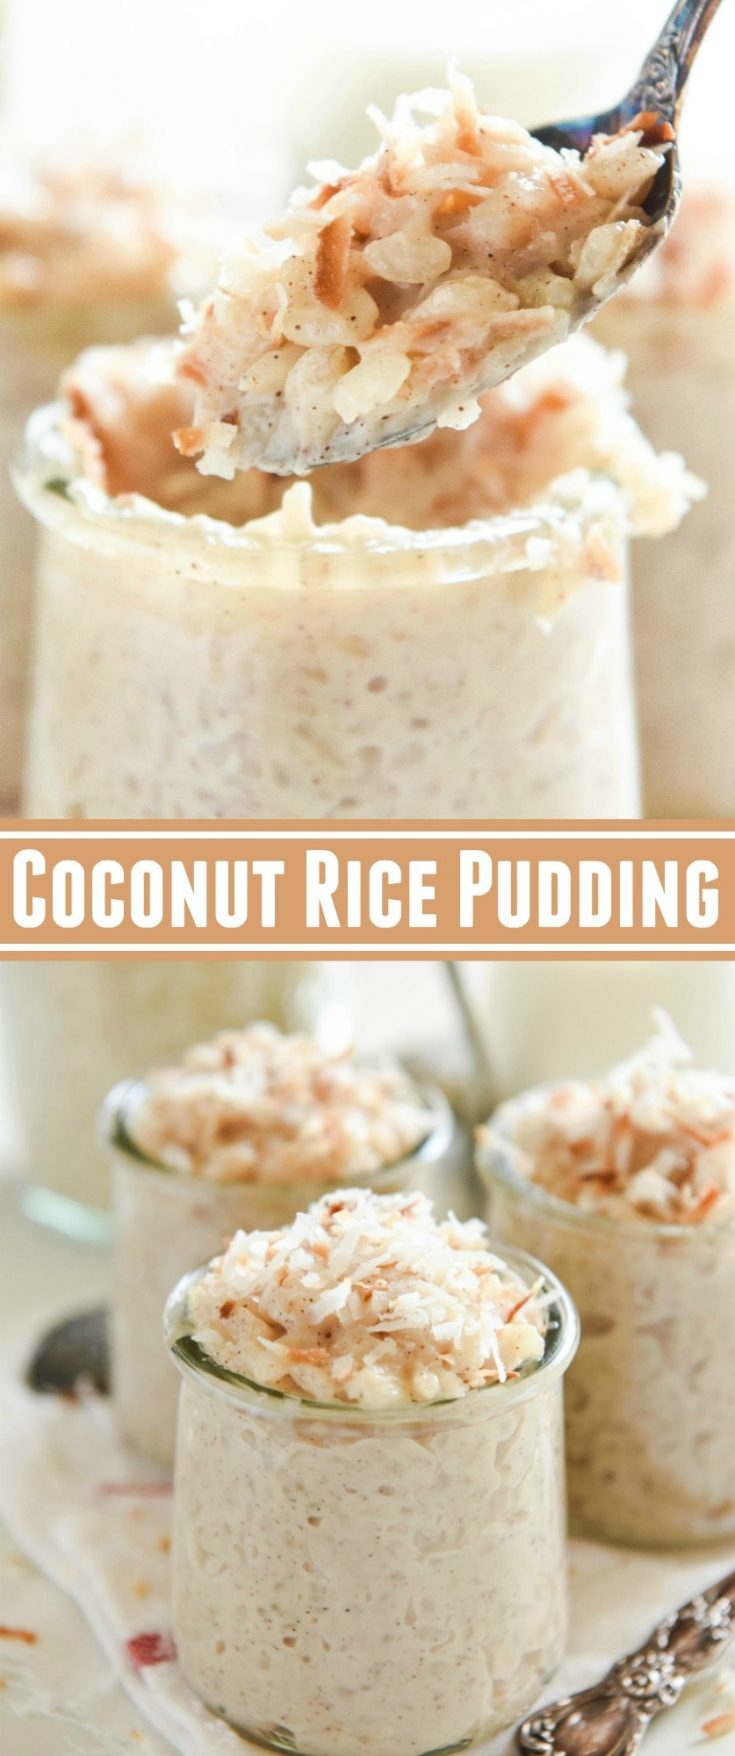 Coconut Rice Pudding: Disney Cruise Copycat Recipe | The ...